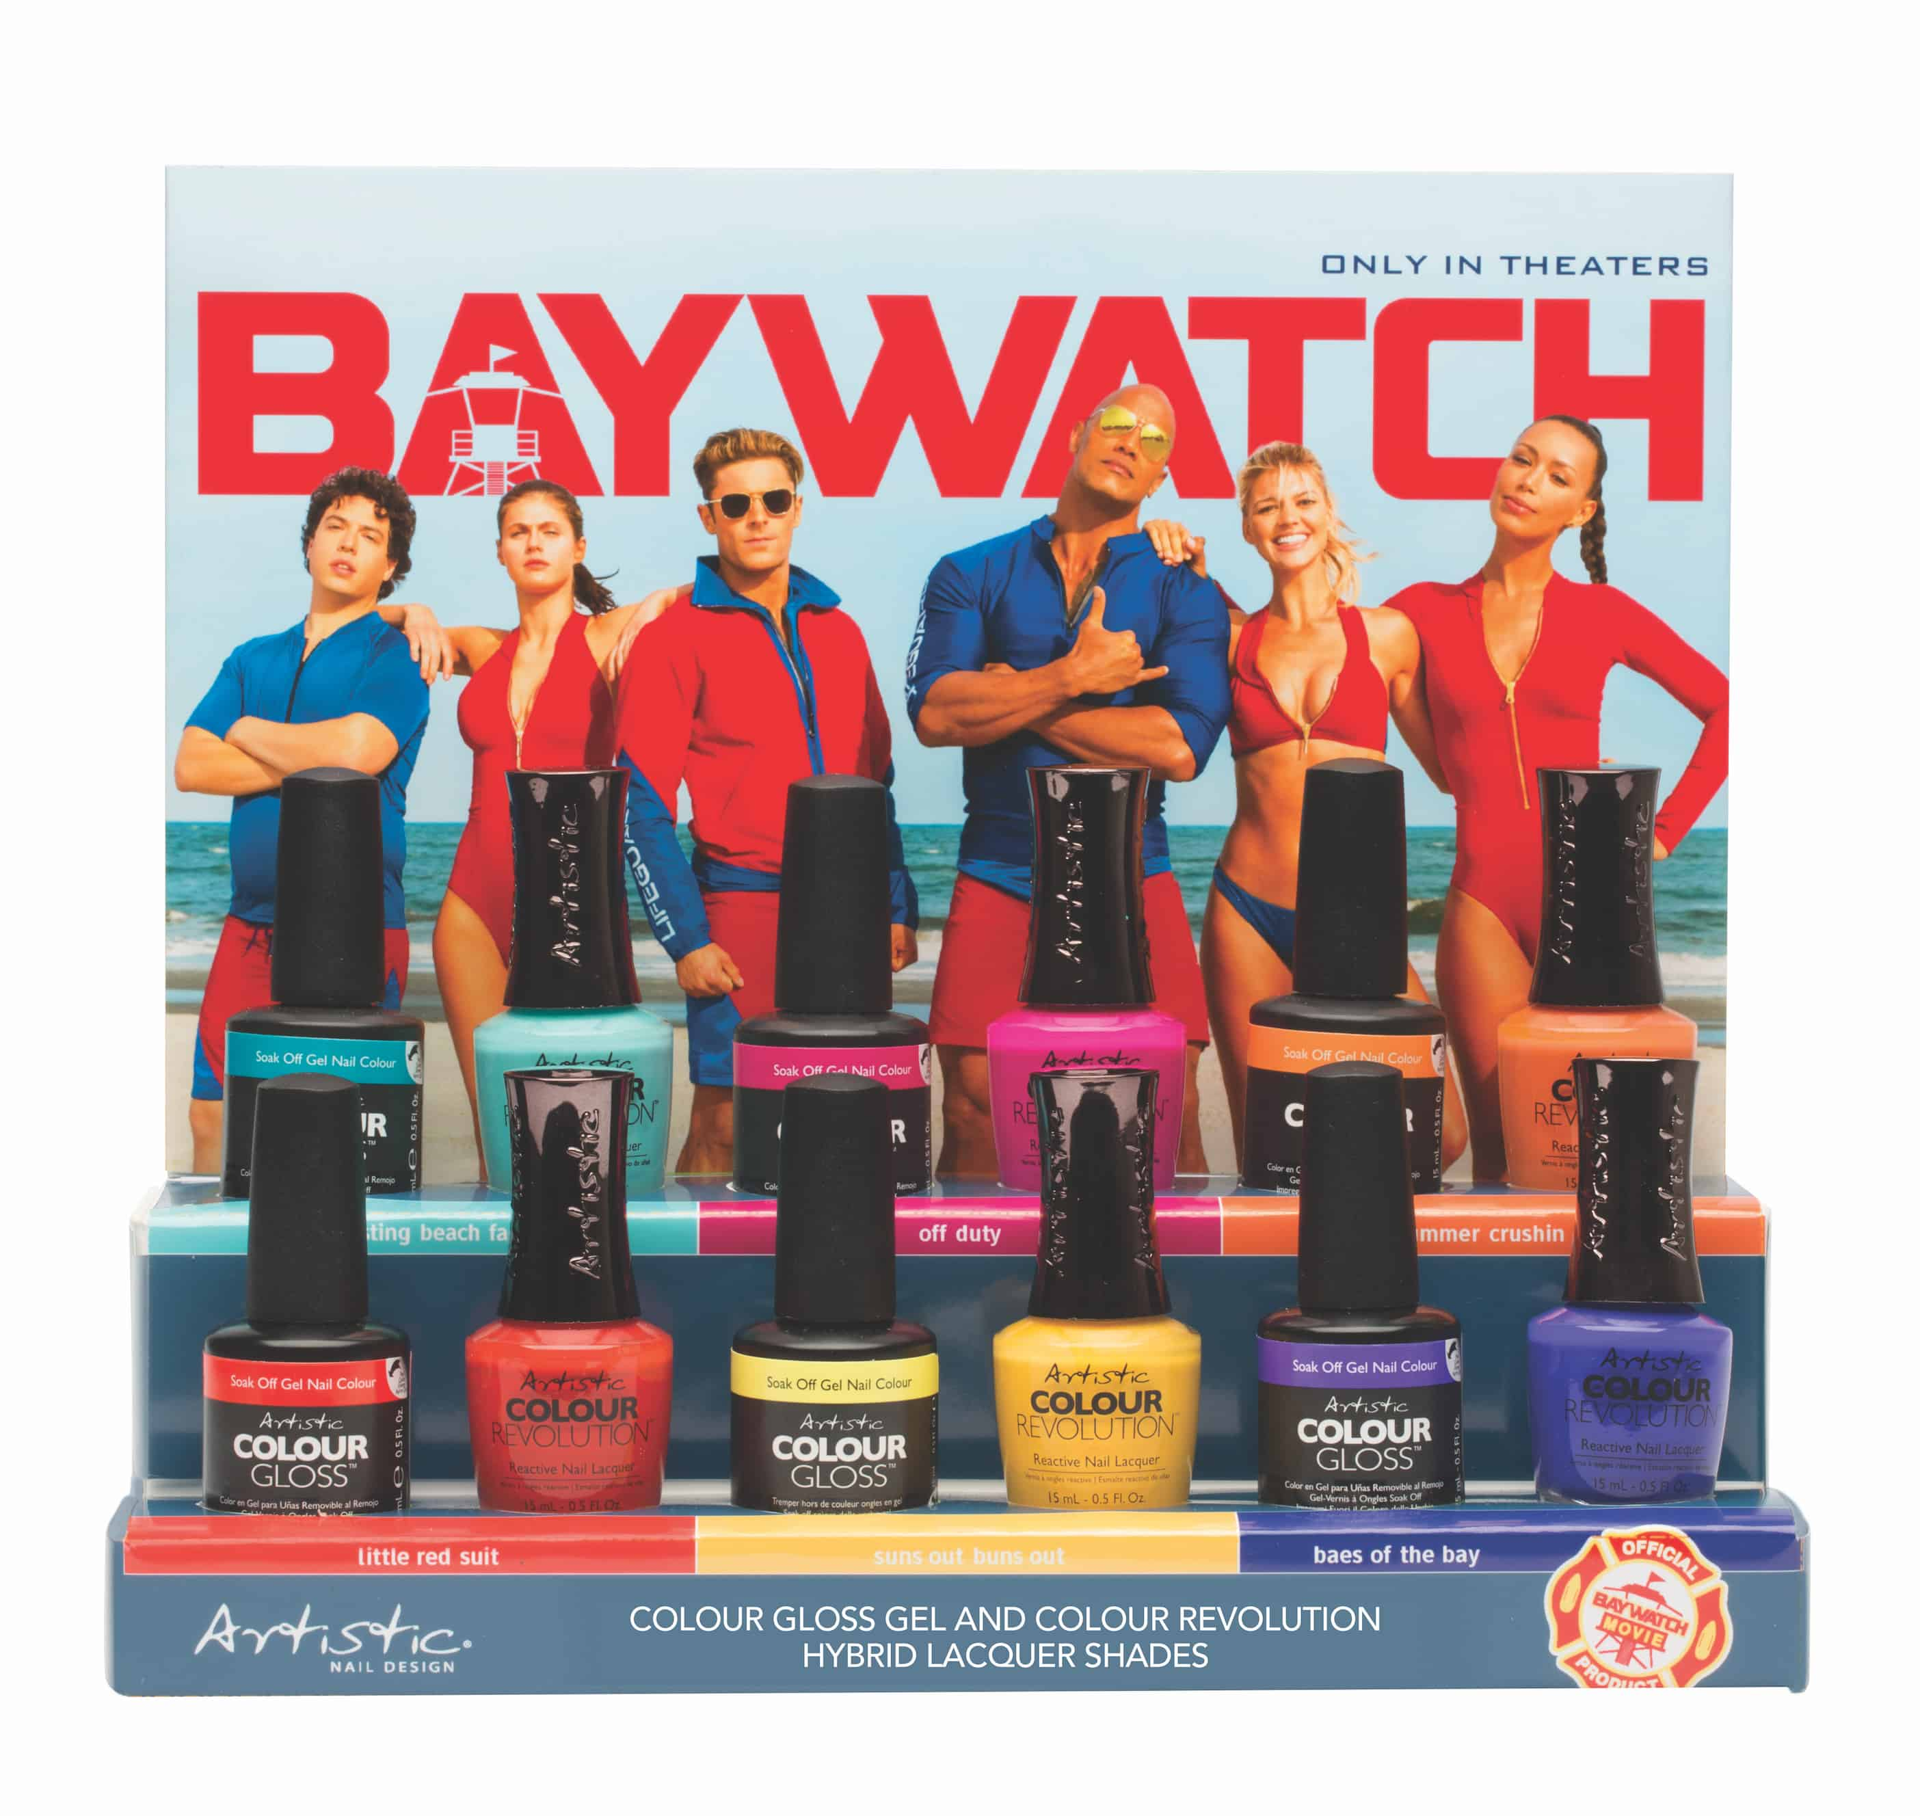 smalti Baywatch